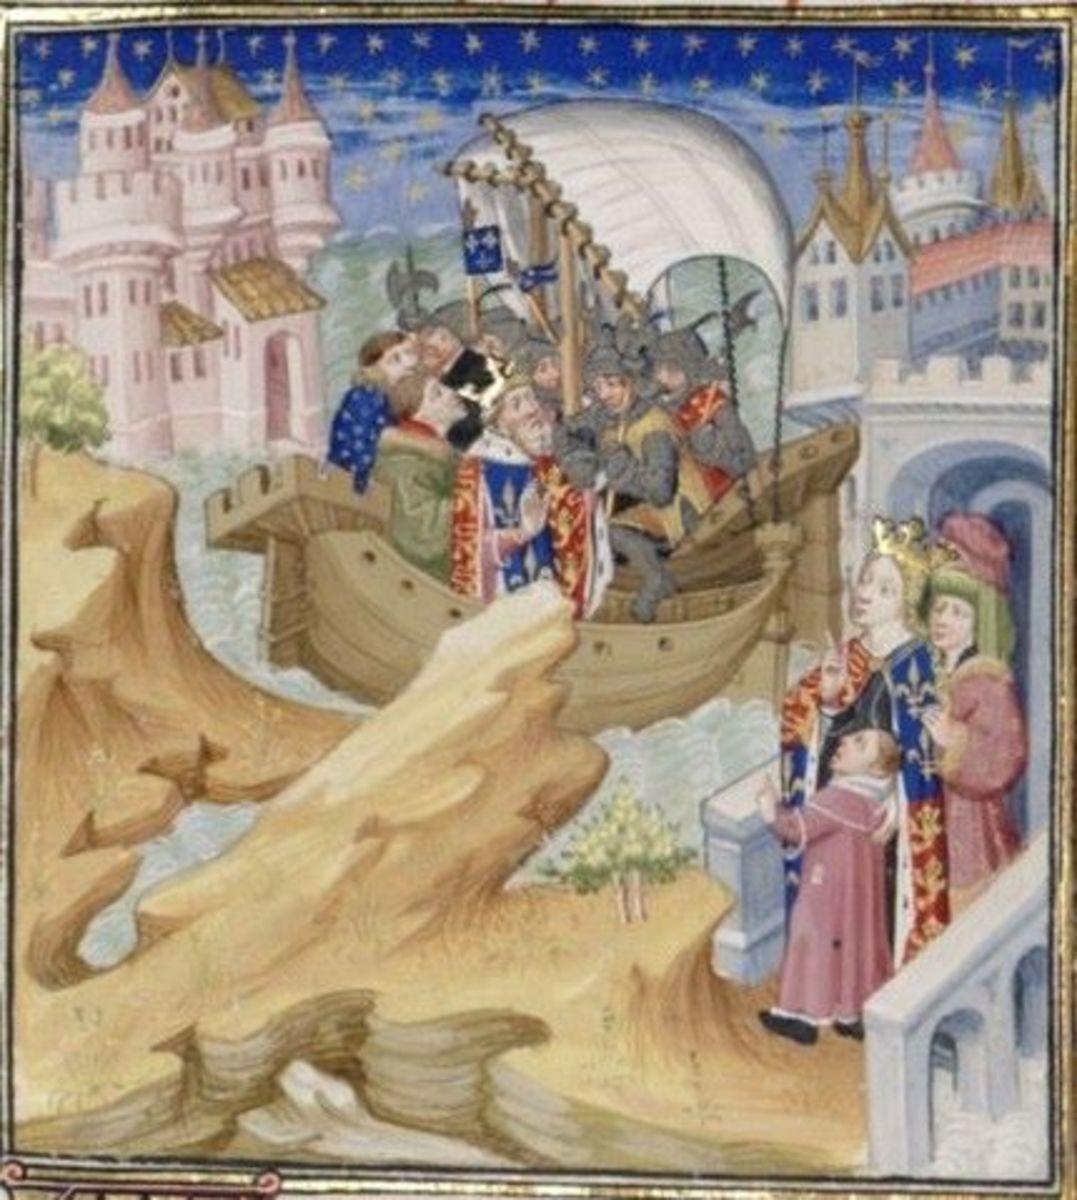 A romanticised depiction of Edward II's arrest.